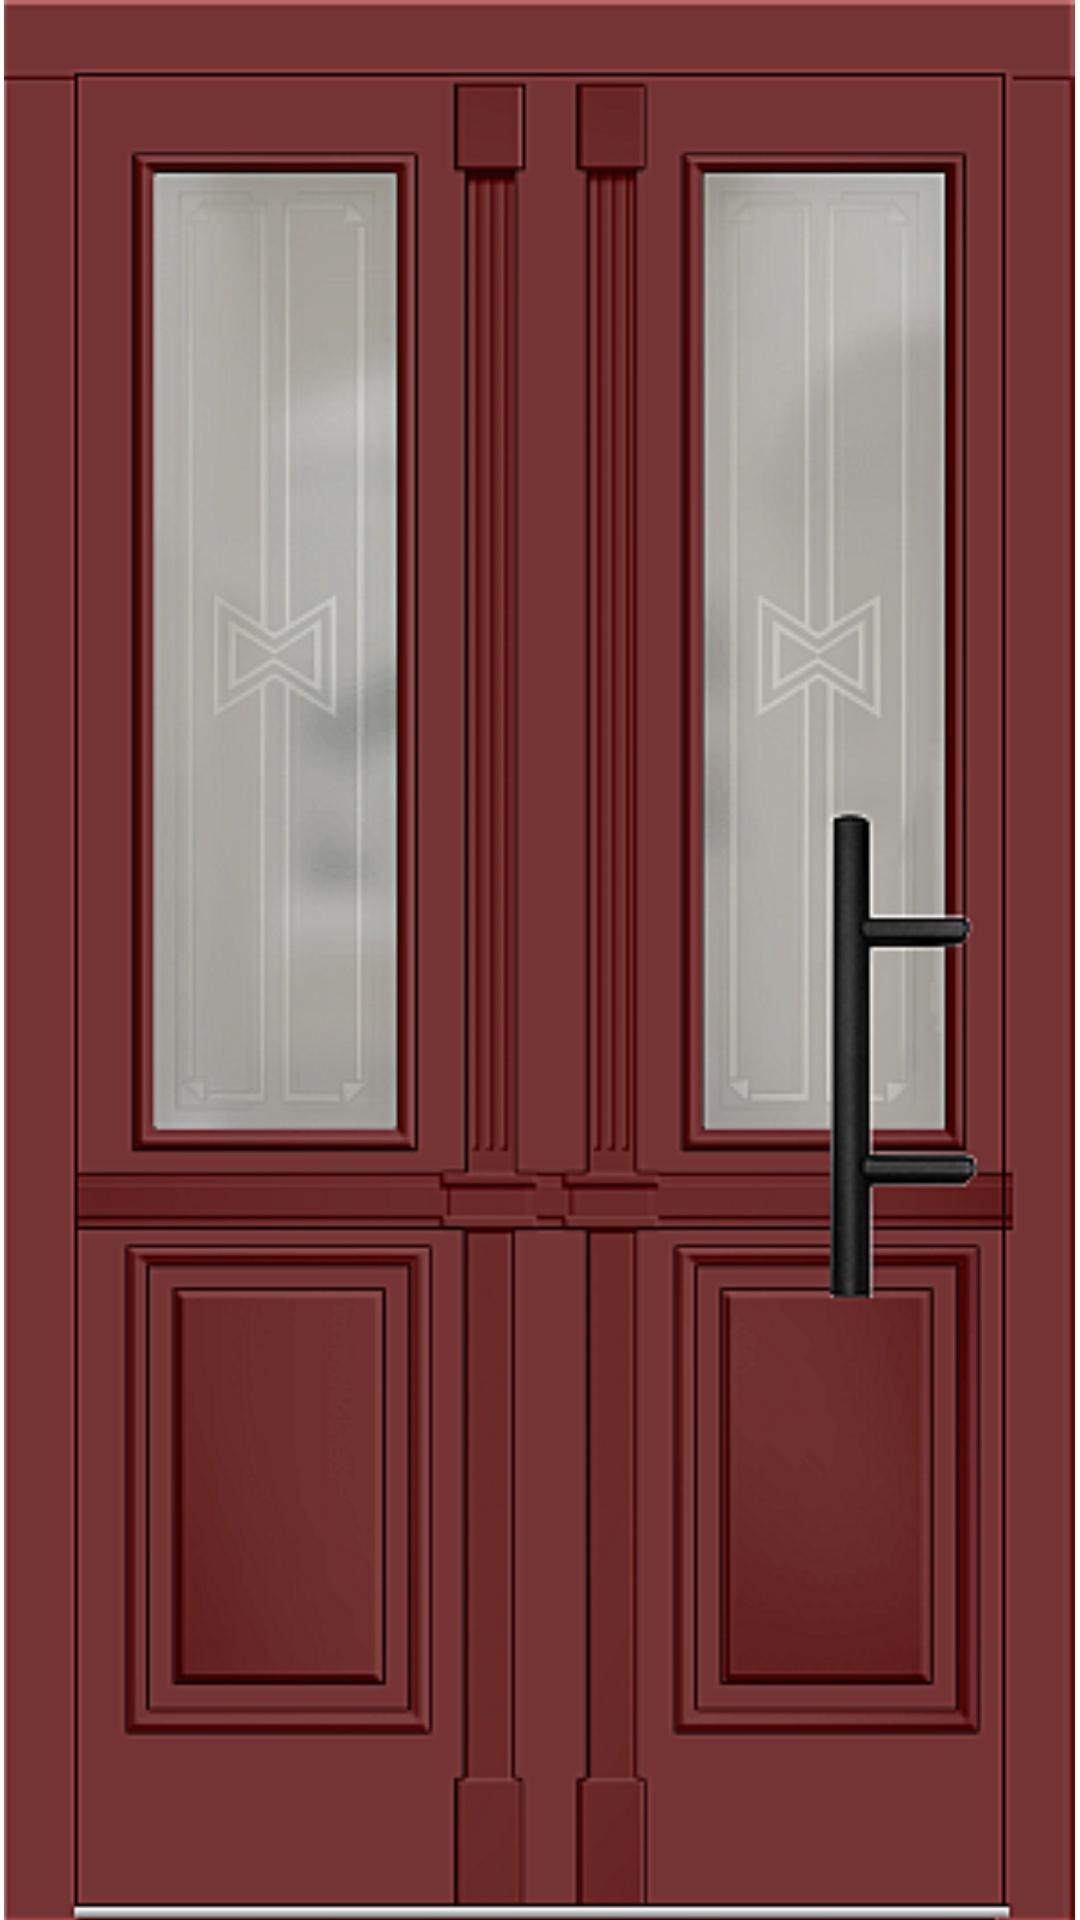 Holz Haustür Modell 7210 rubinrot